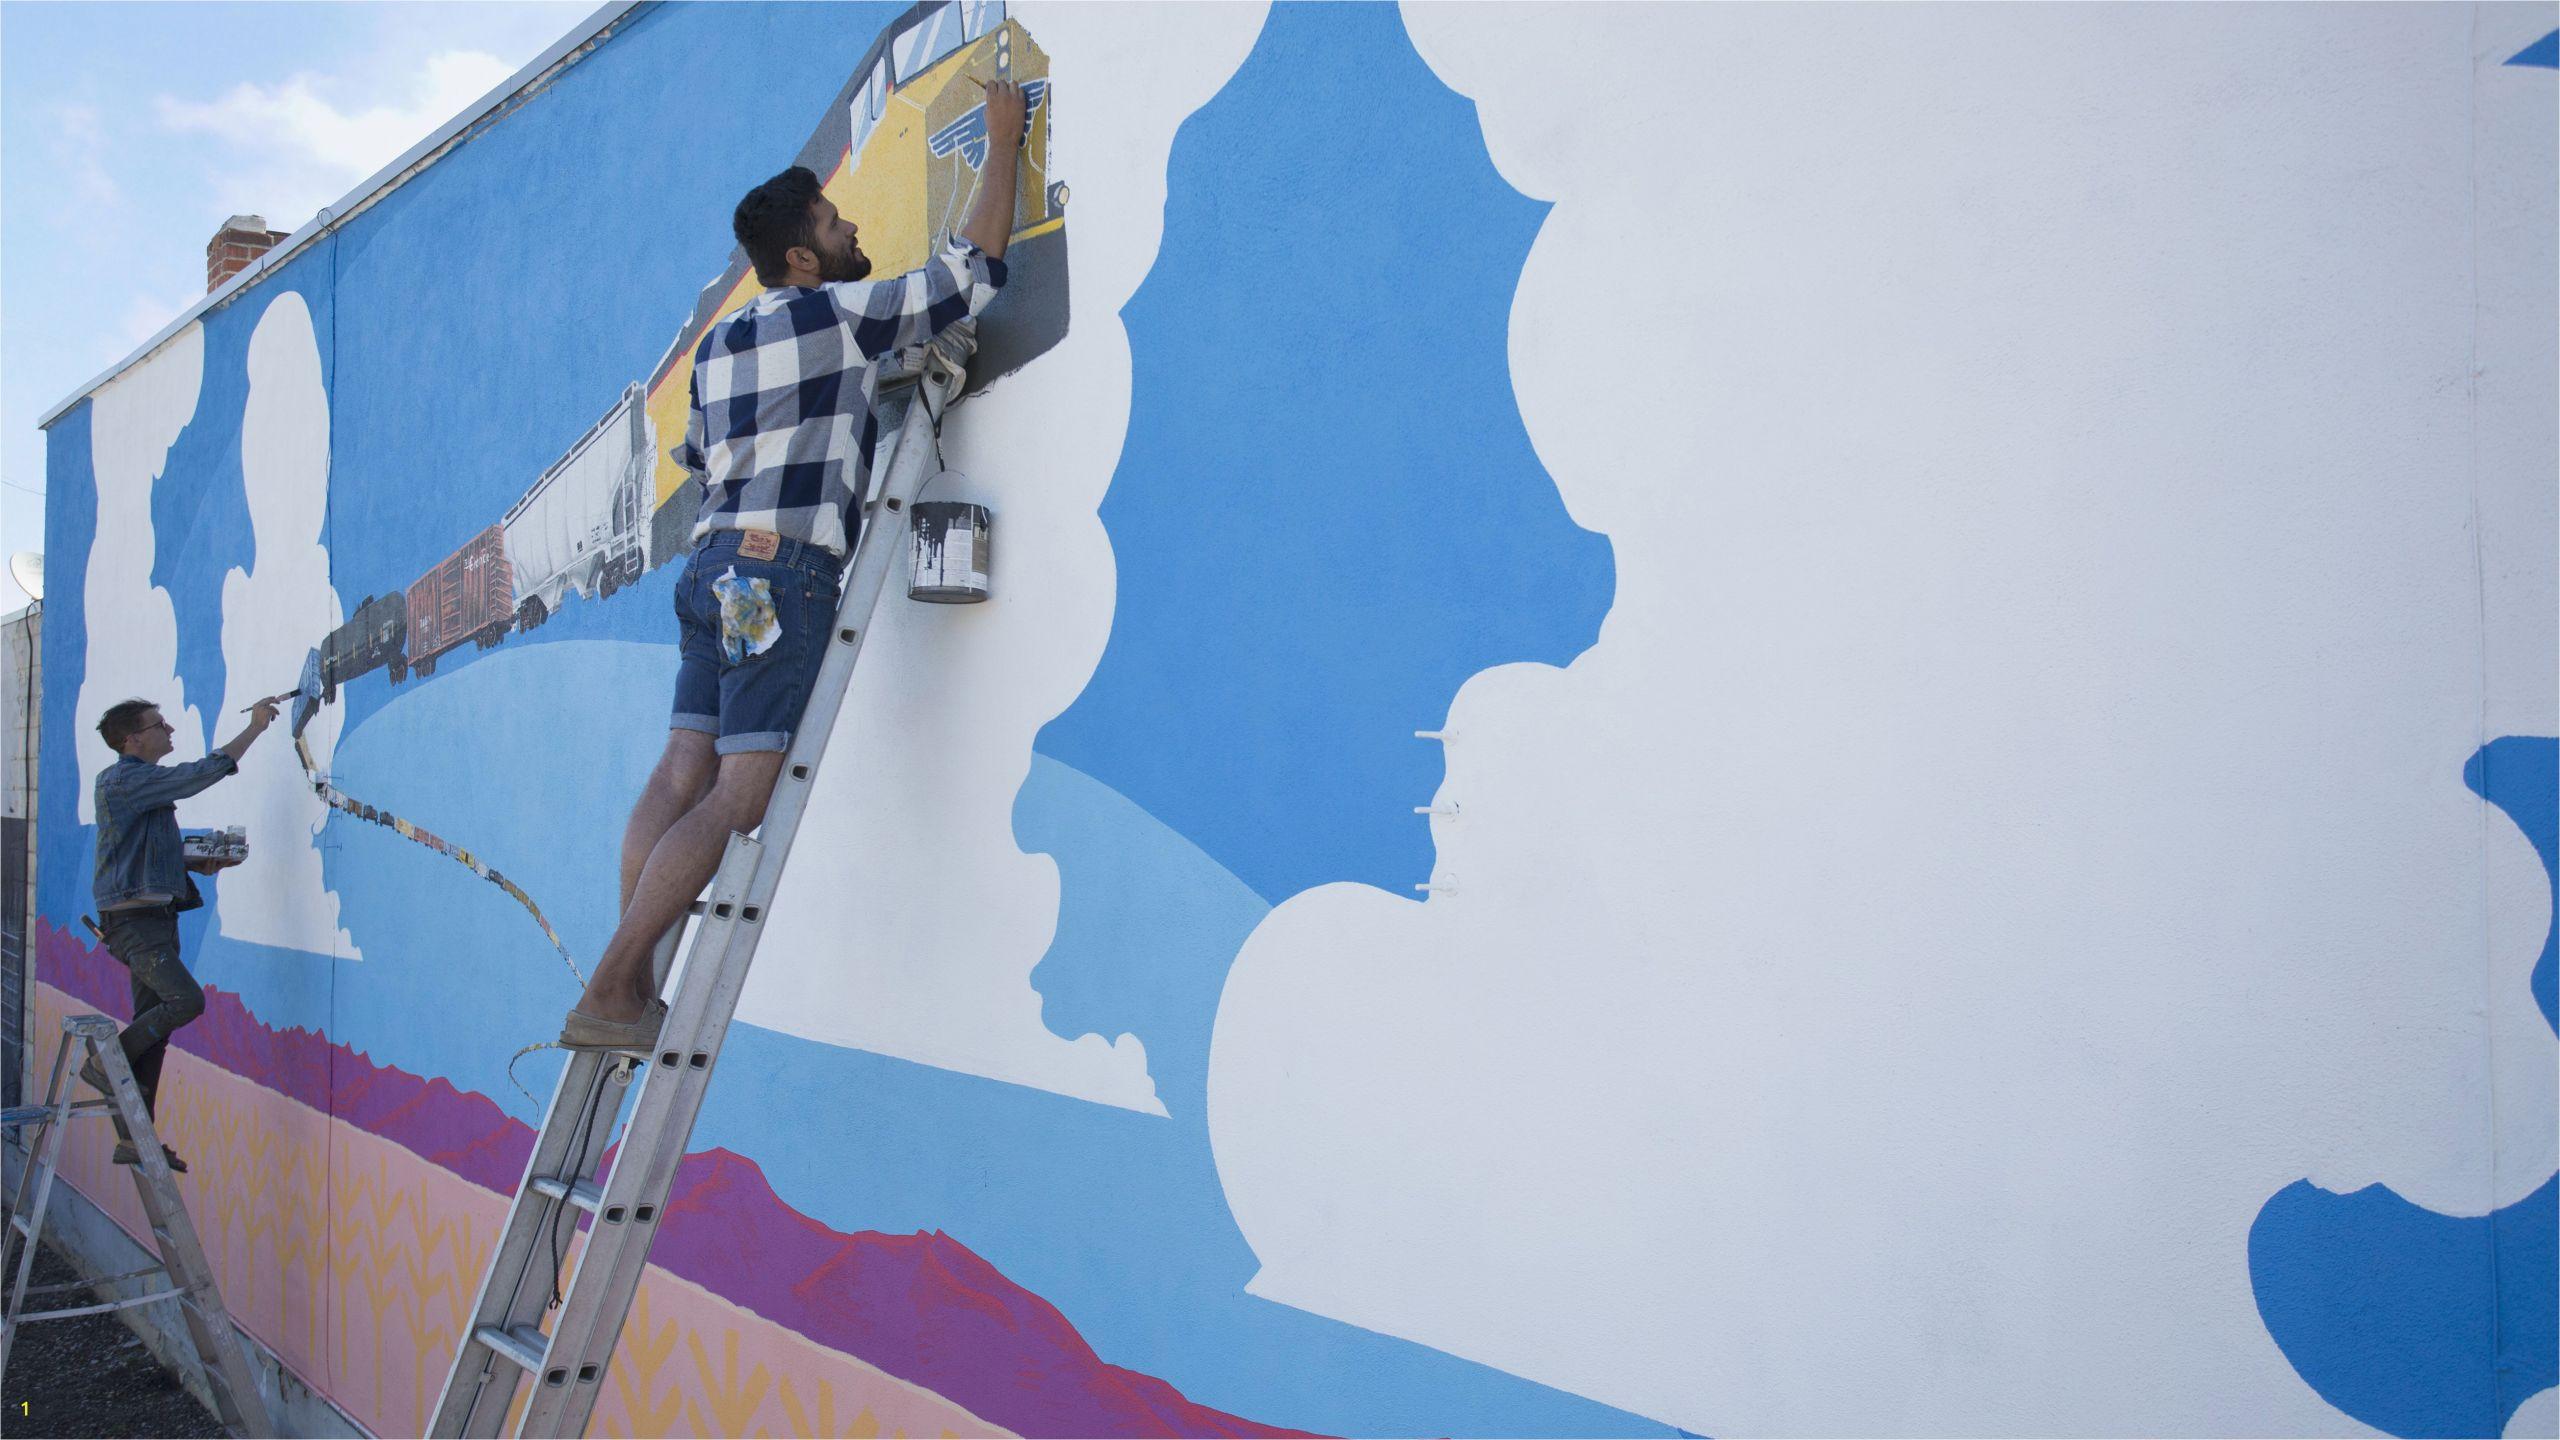 artists painting mural wall fdc5f9b58d5b185b9c4